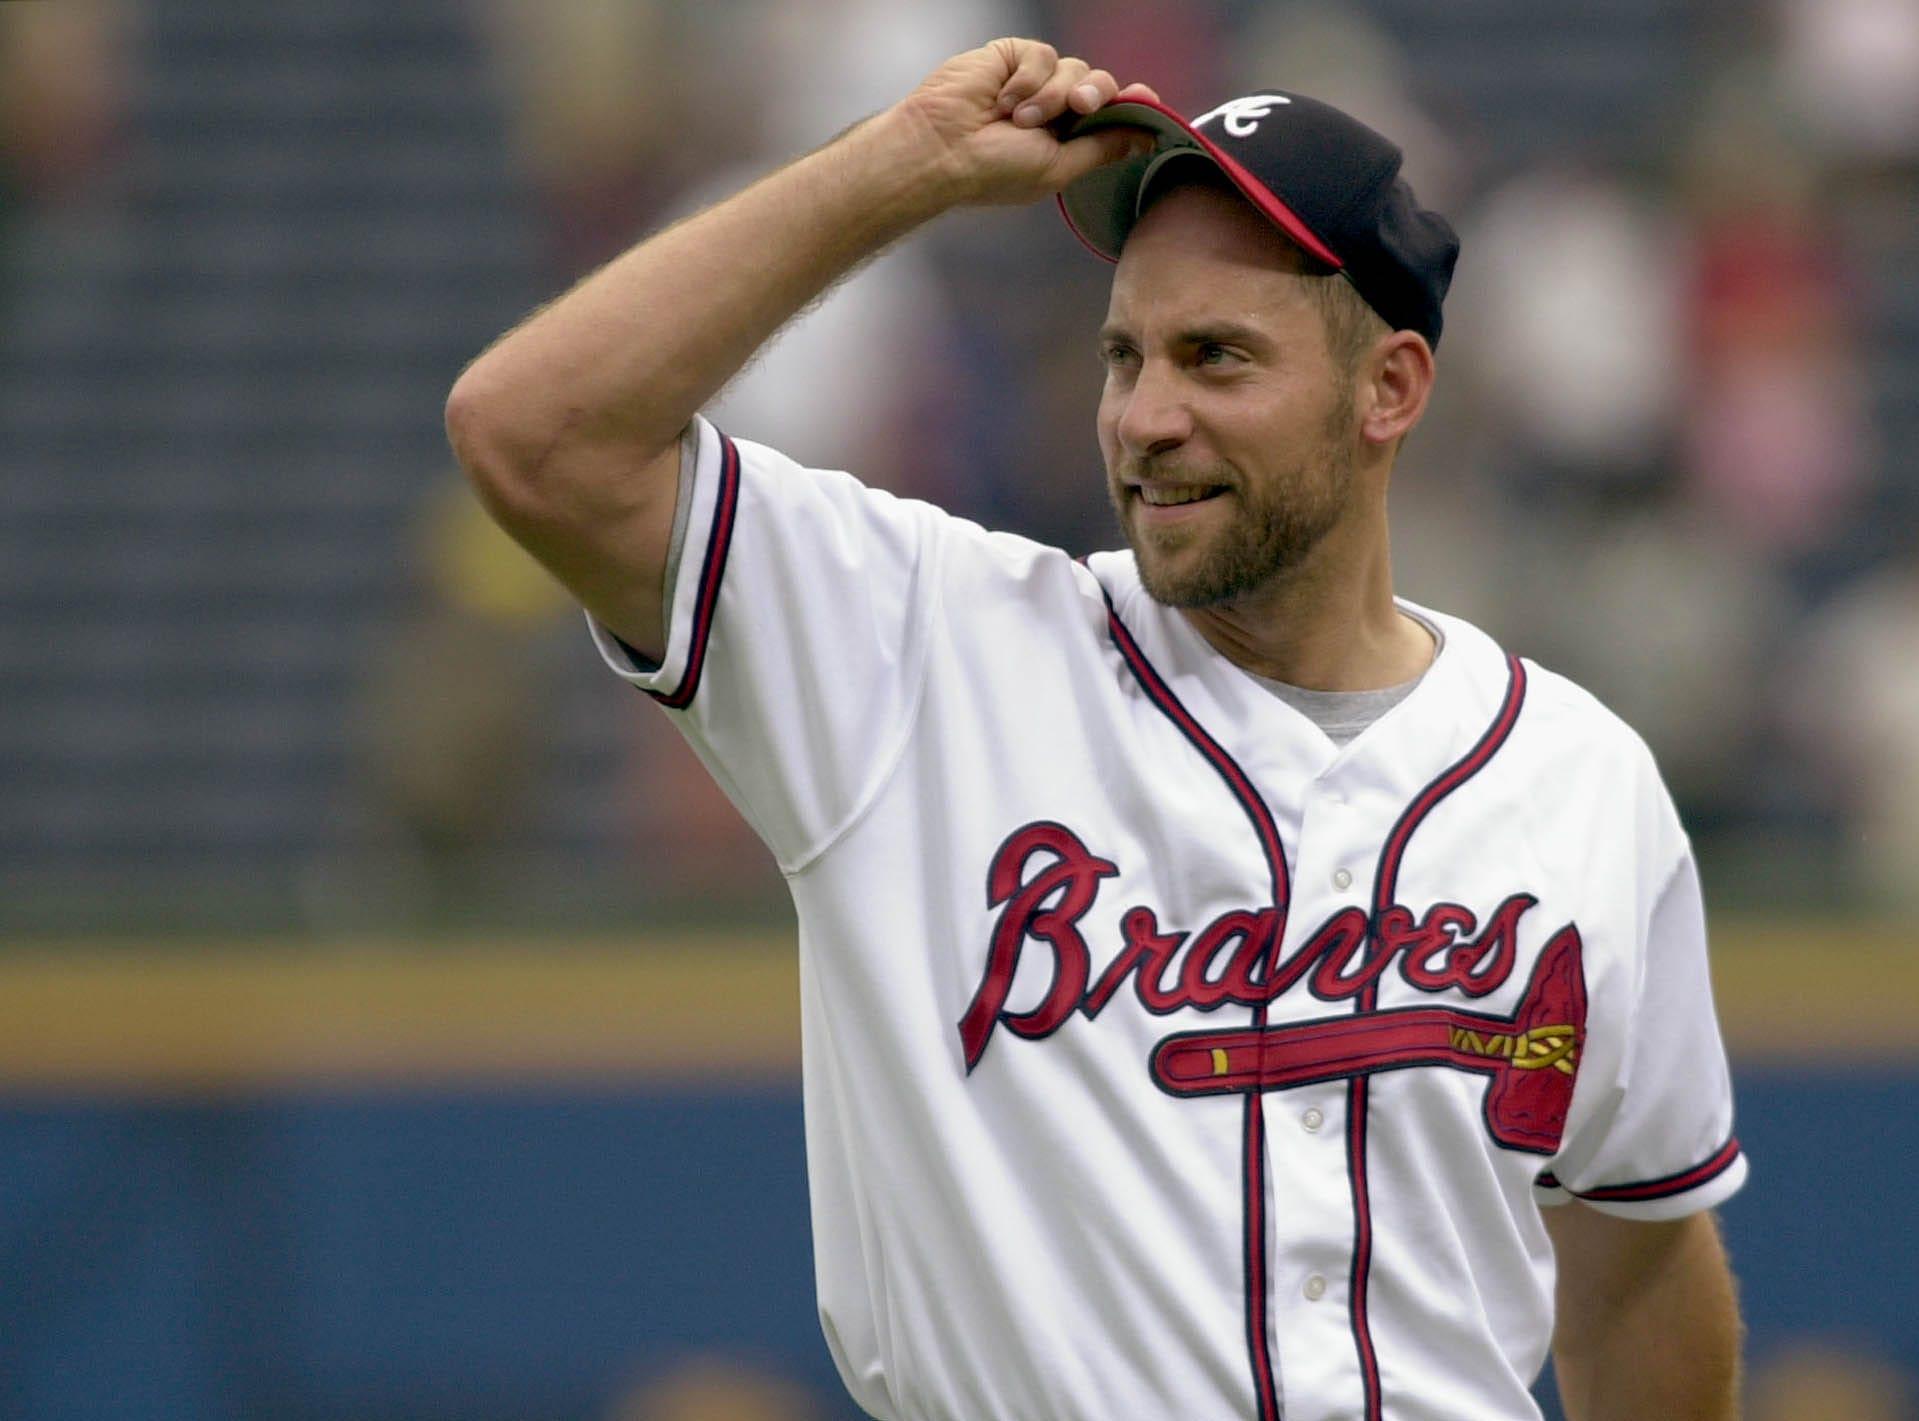 55 – John Smoltz, Braves, 2002